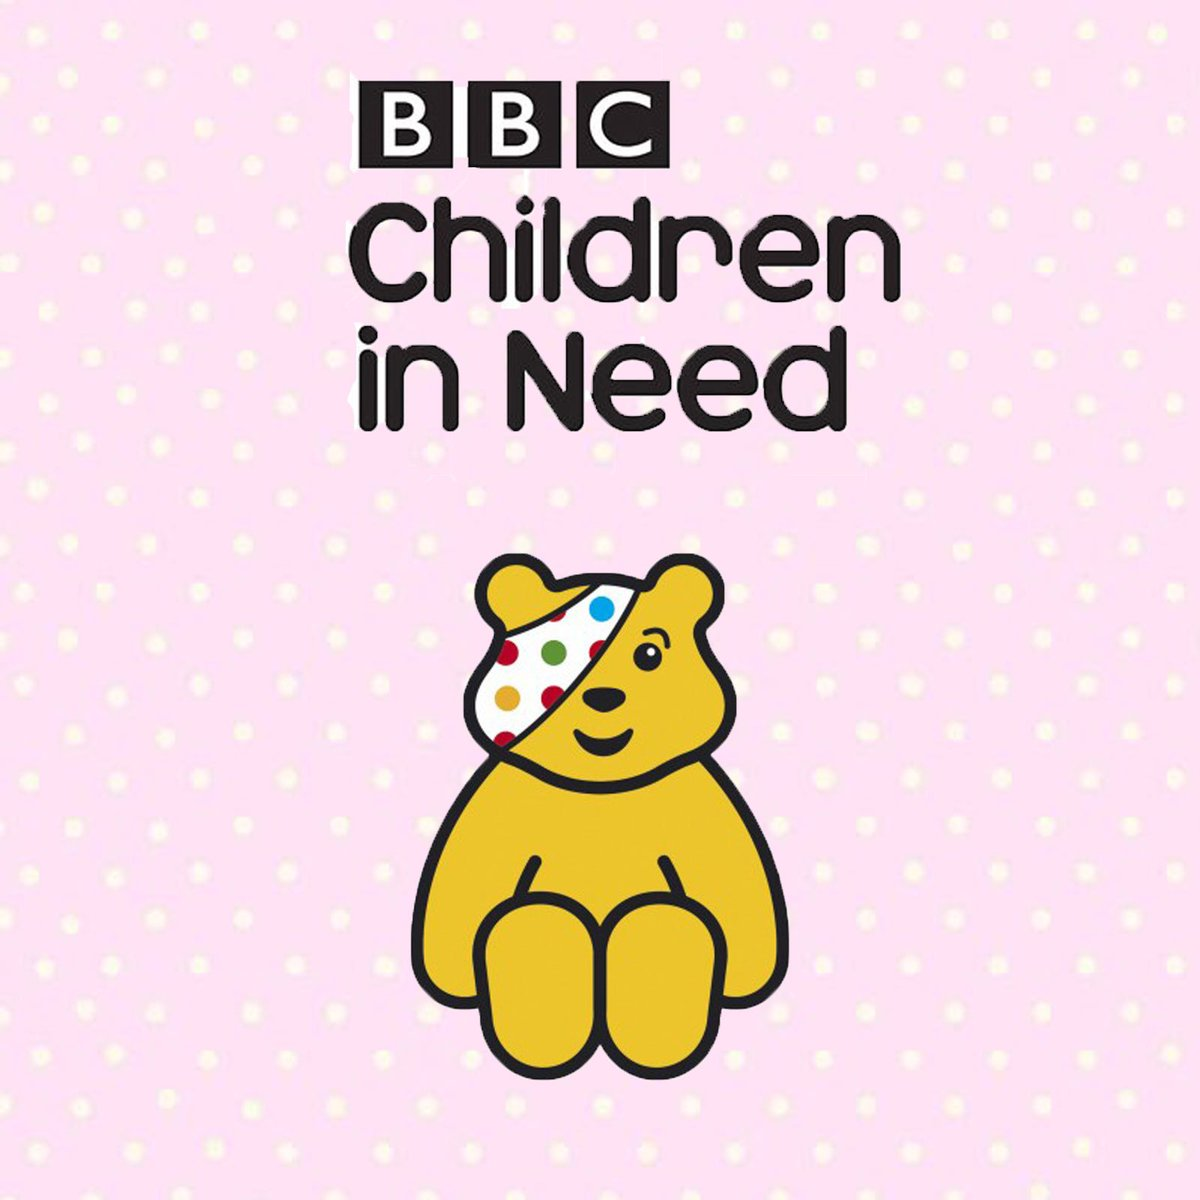 RT @WOWallpaperUK: Don't forget to support this amazing charity! #ChildrenInNeed #FridayFeeling #BBCChildrenInNeed https://t.co/eU63cLzhGS